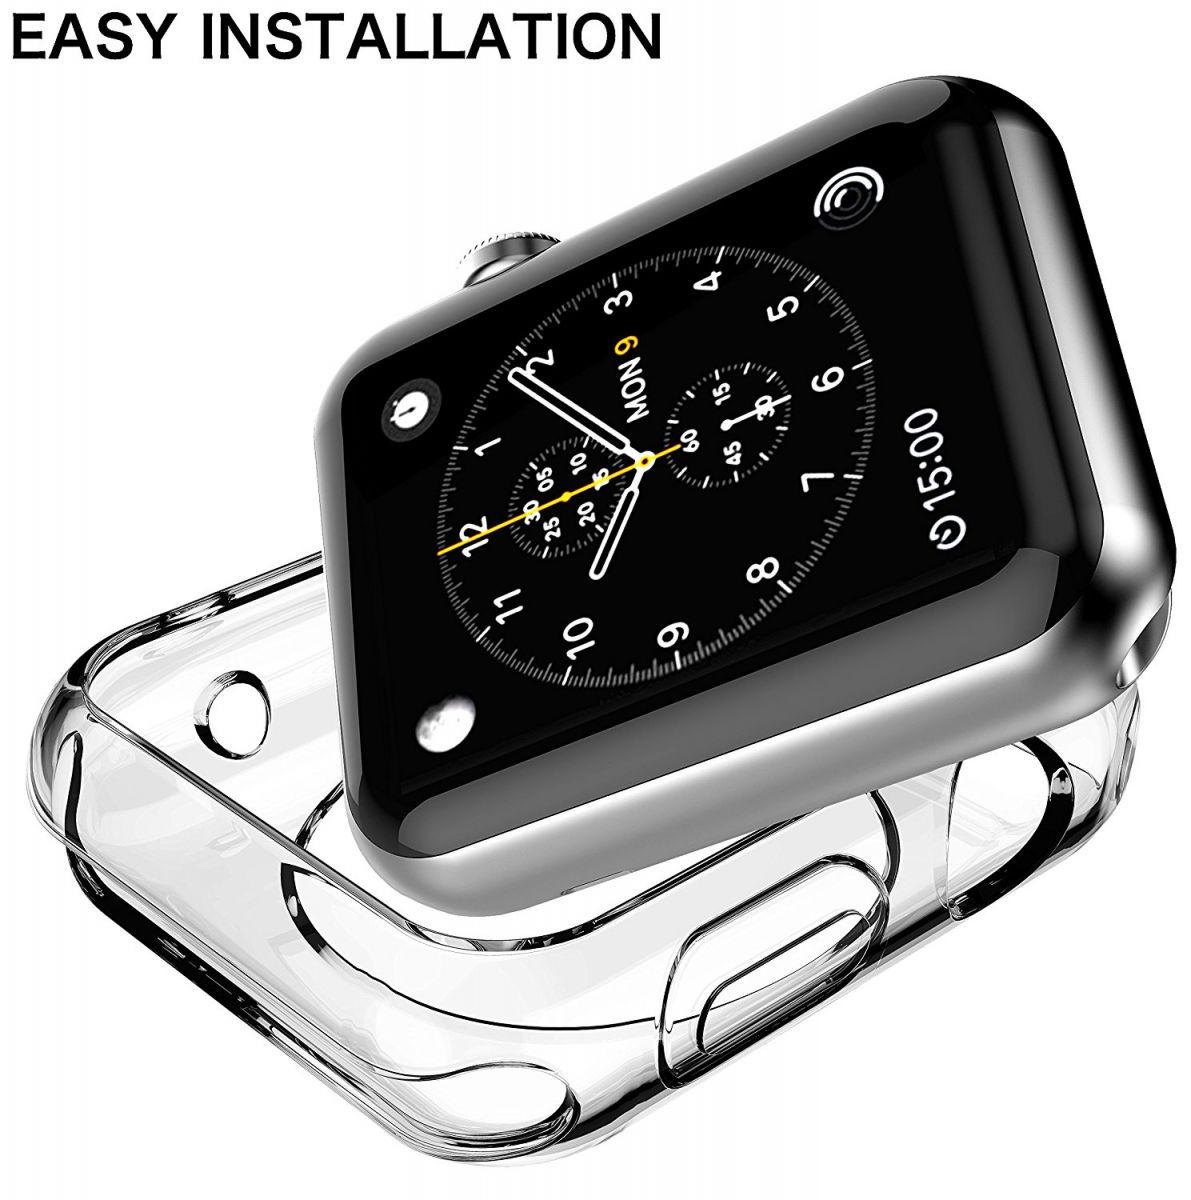 obal kryt pouzdro na hodinky apple watch 42mm a 38mm pruhledne cire transparentni silikonove tenke slim ultratenke kvalitni 2